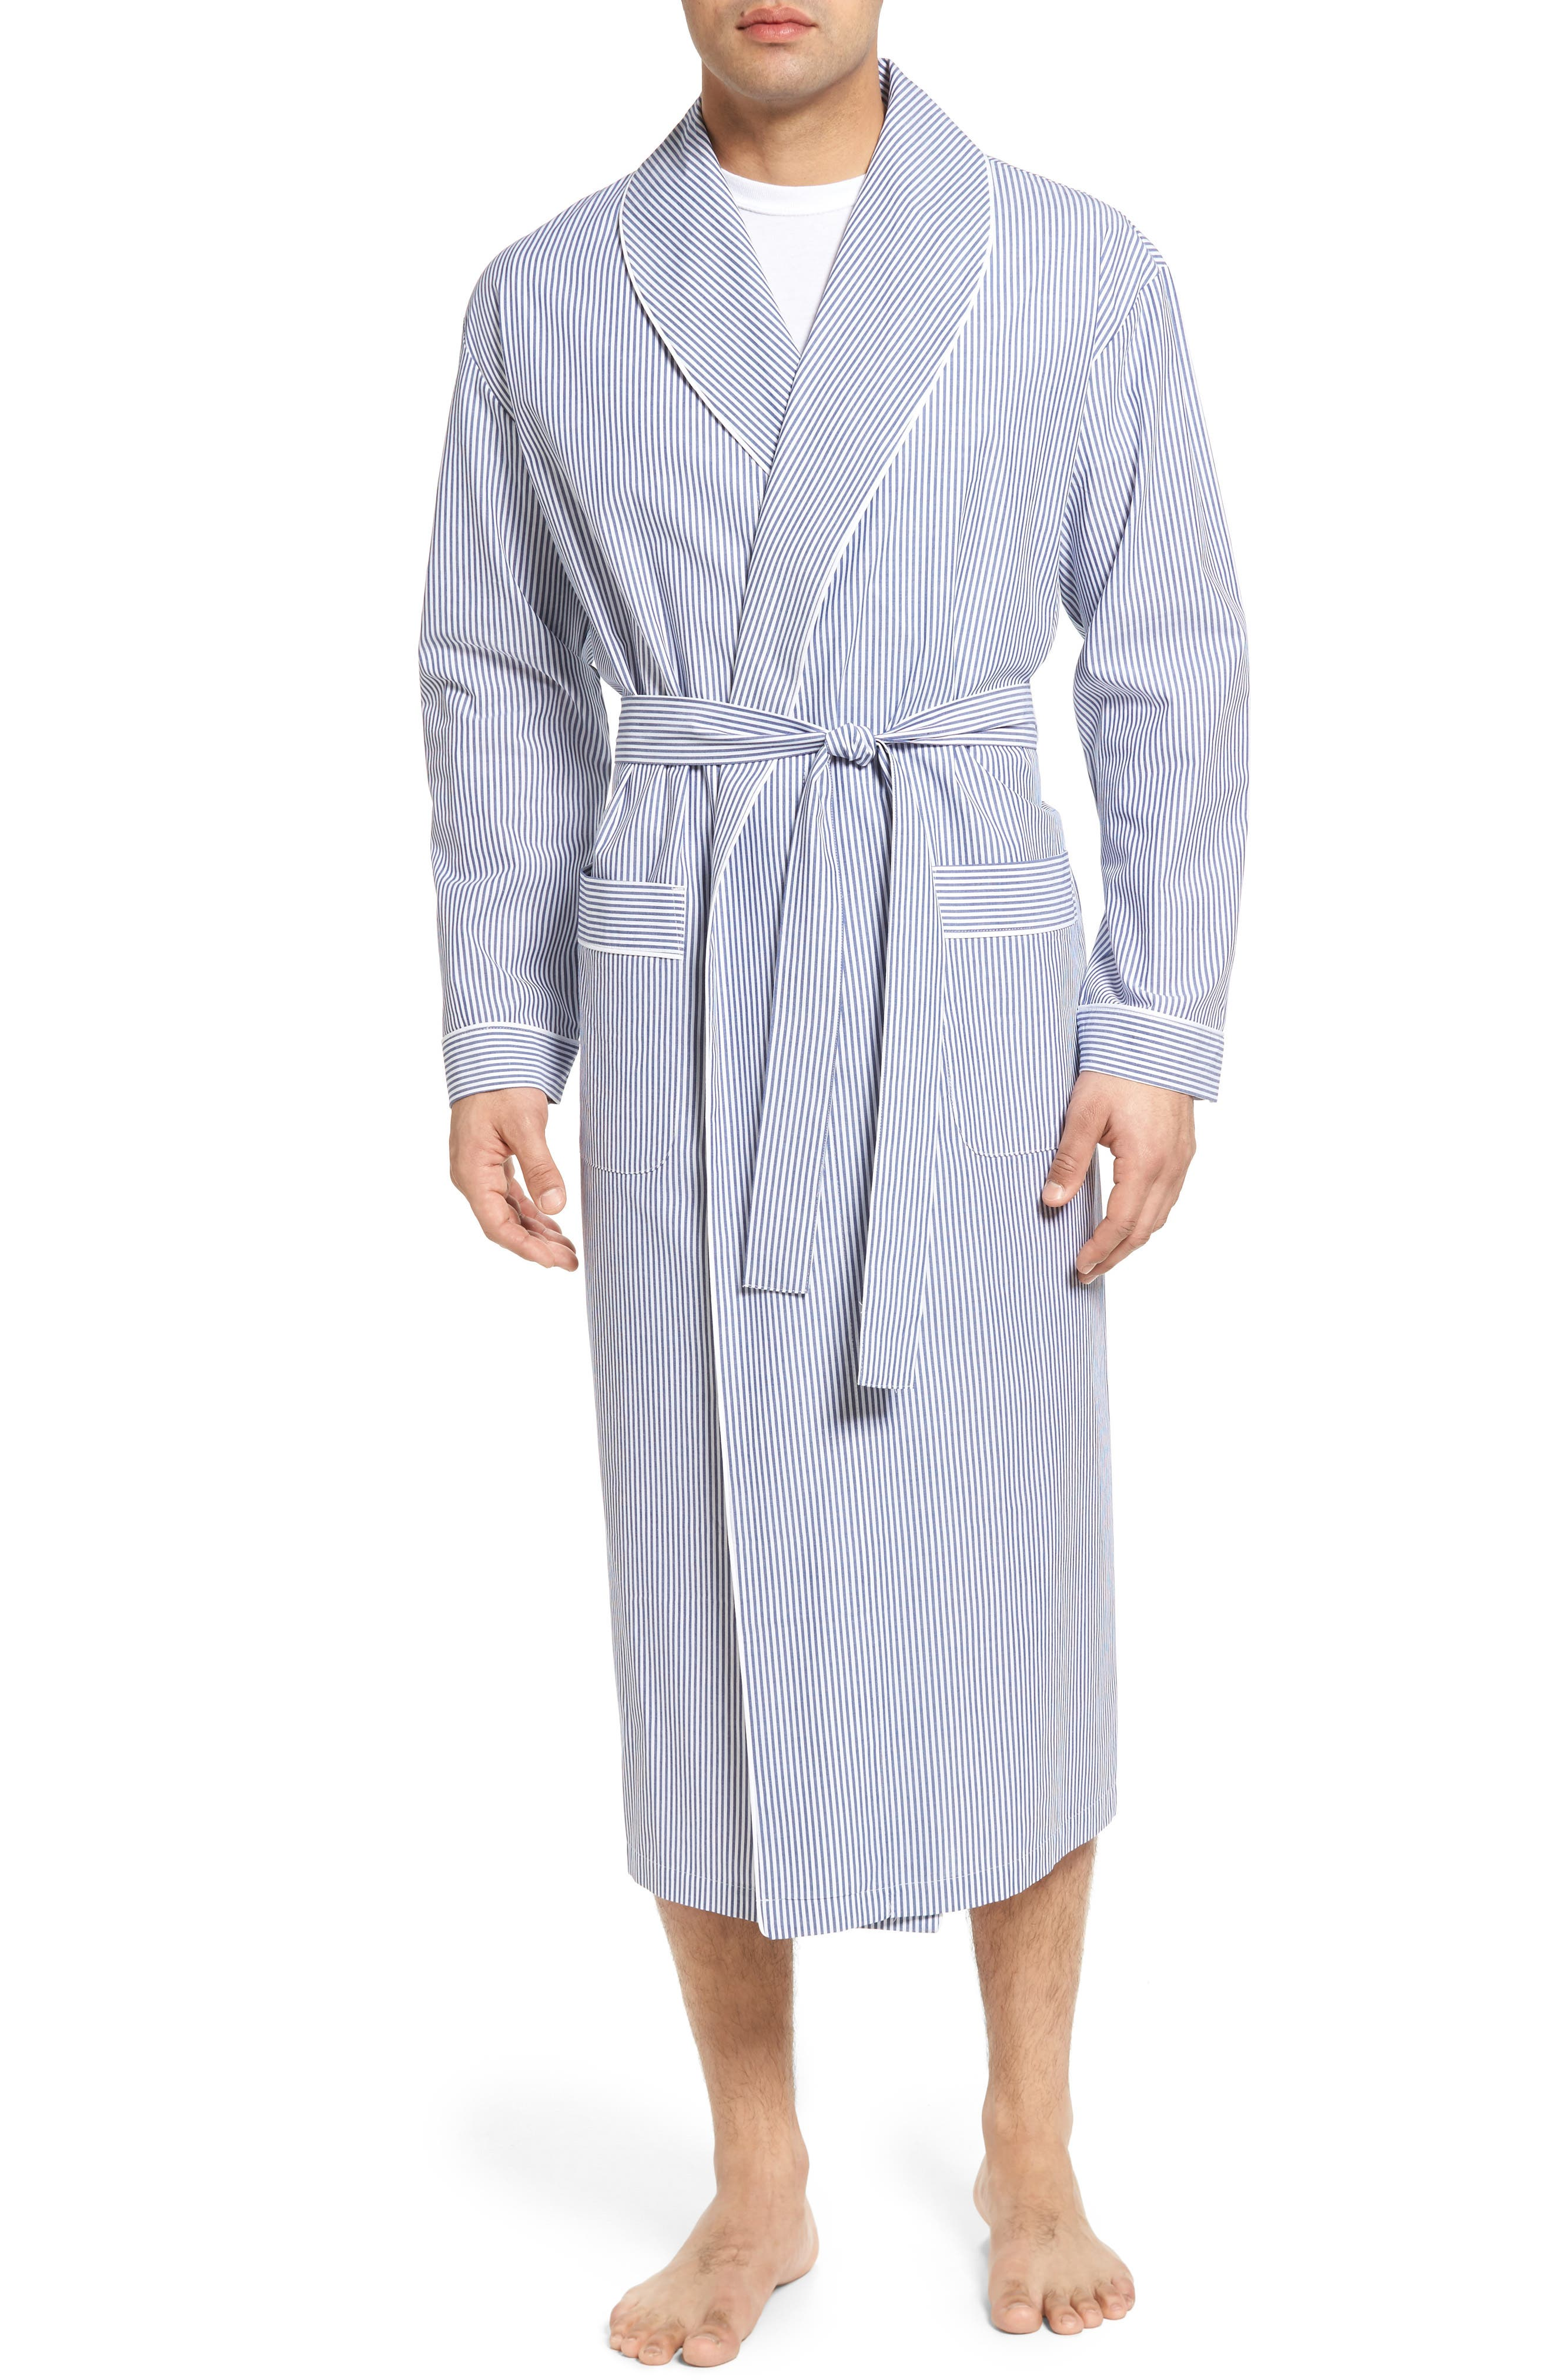 Bengal Stripe Robe,                         Main,                         color, Navy/ White